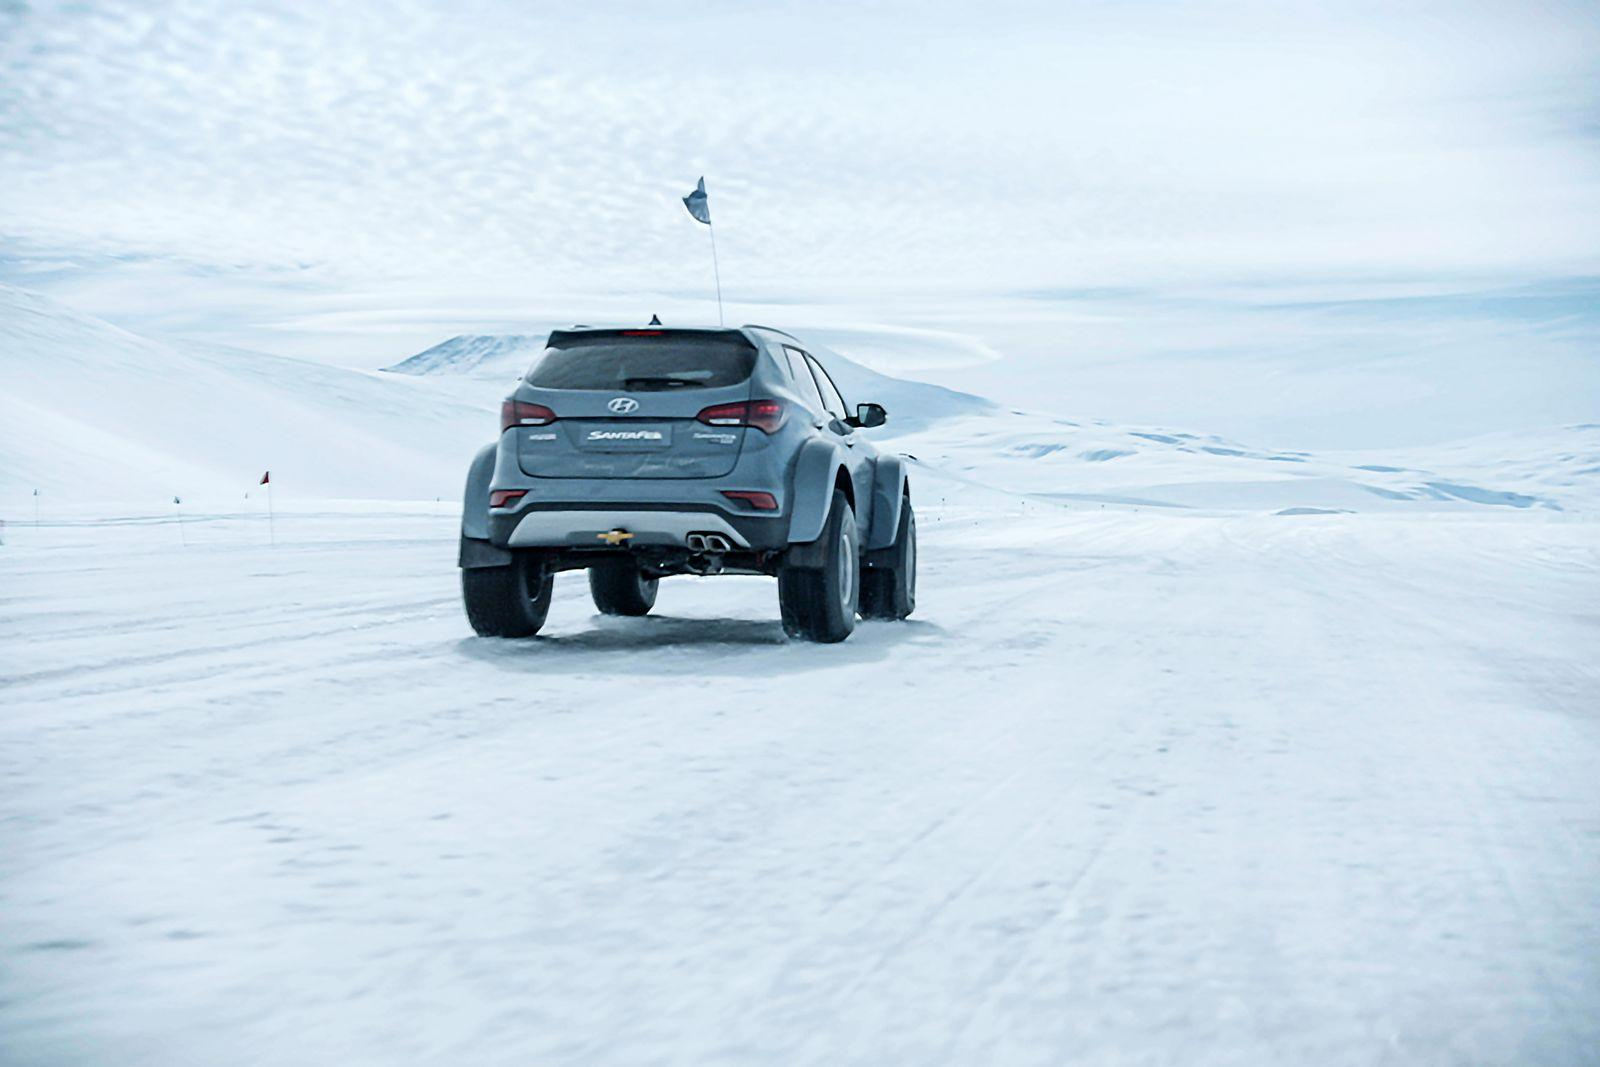 Hyundai Santa Fe in expeditia din Antarctica - Hyundai Santa Fe in expeditia din Antarctica